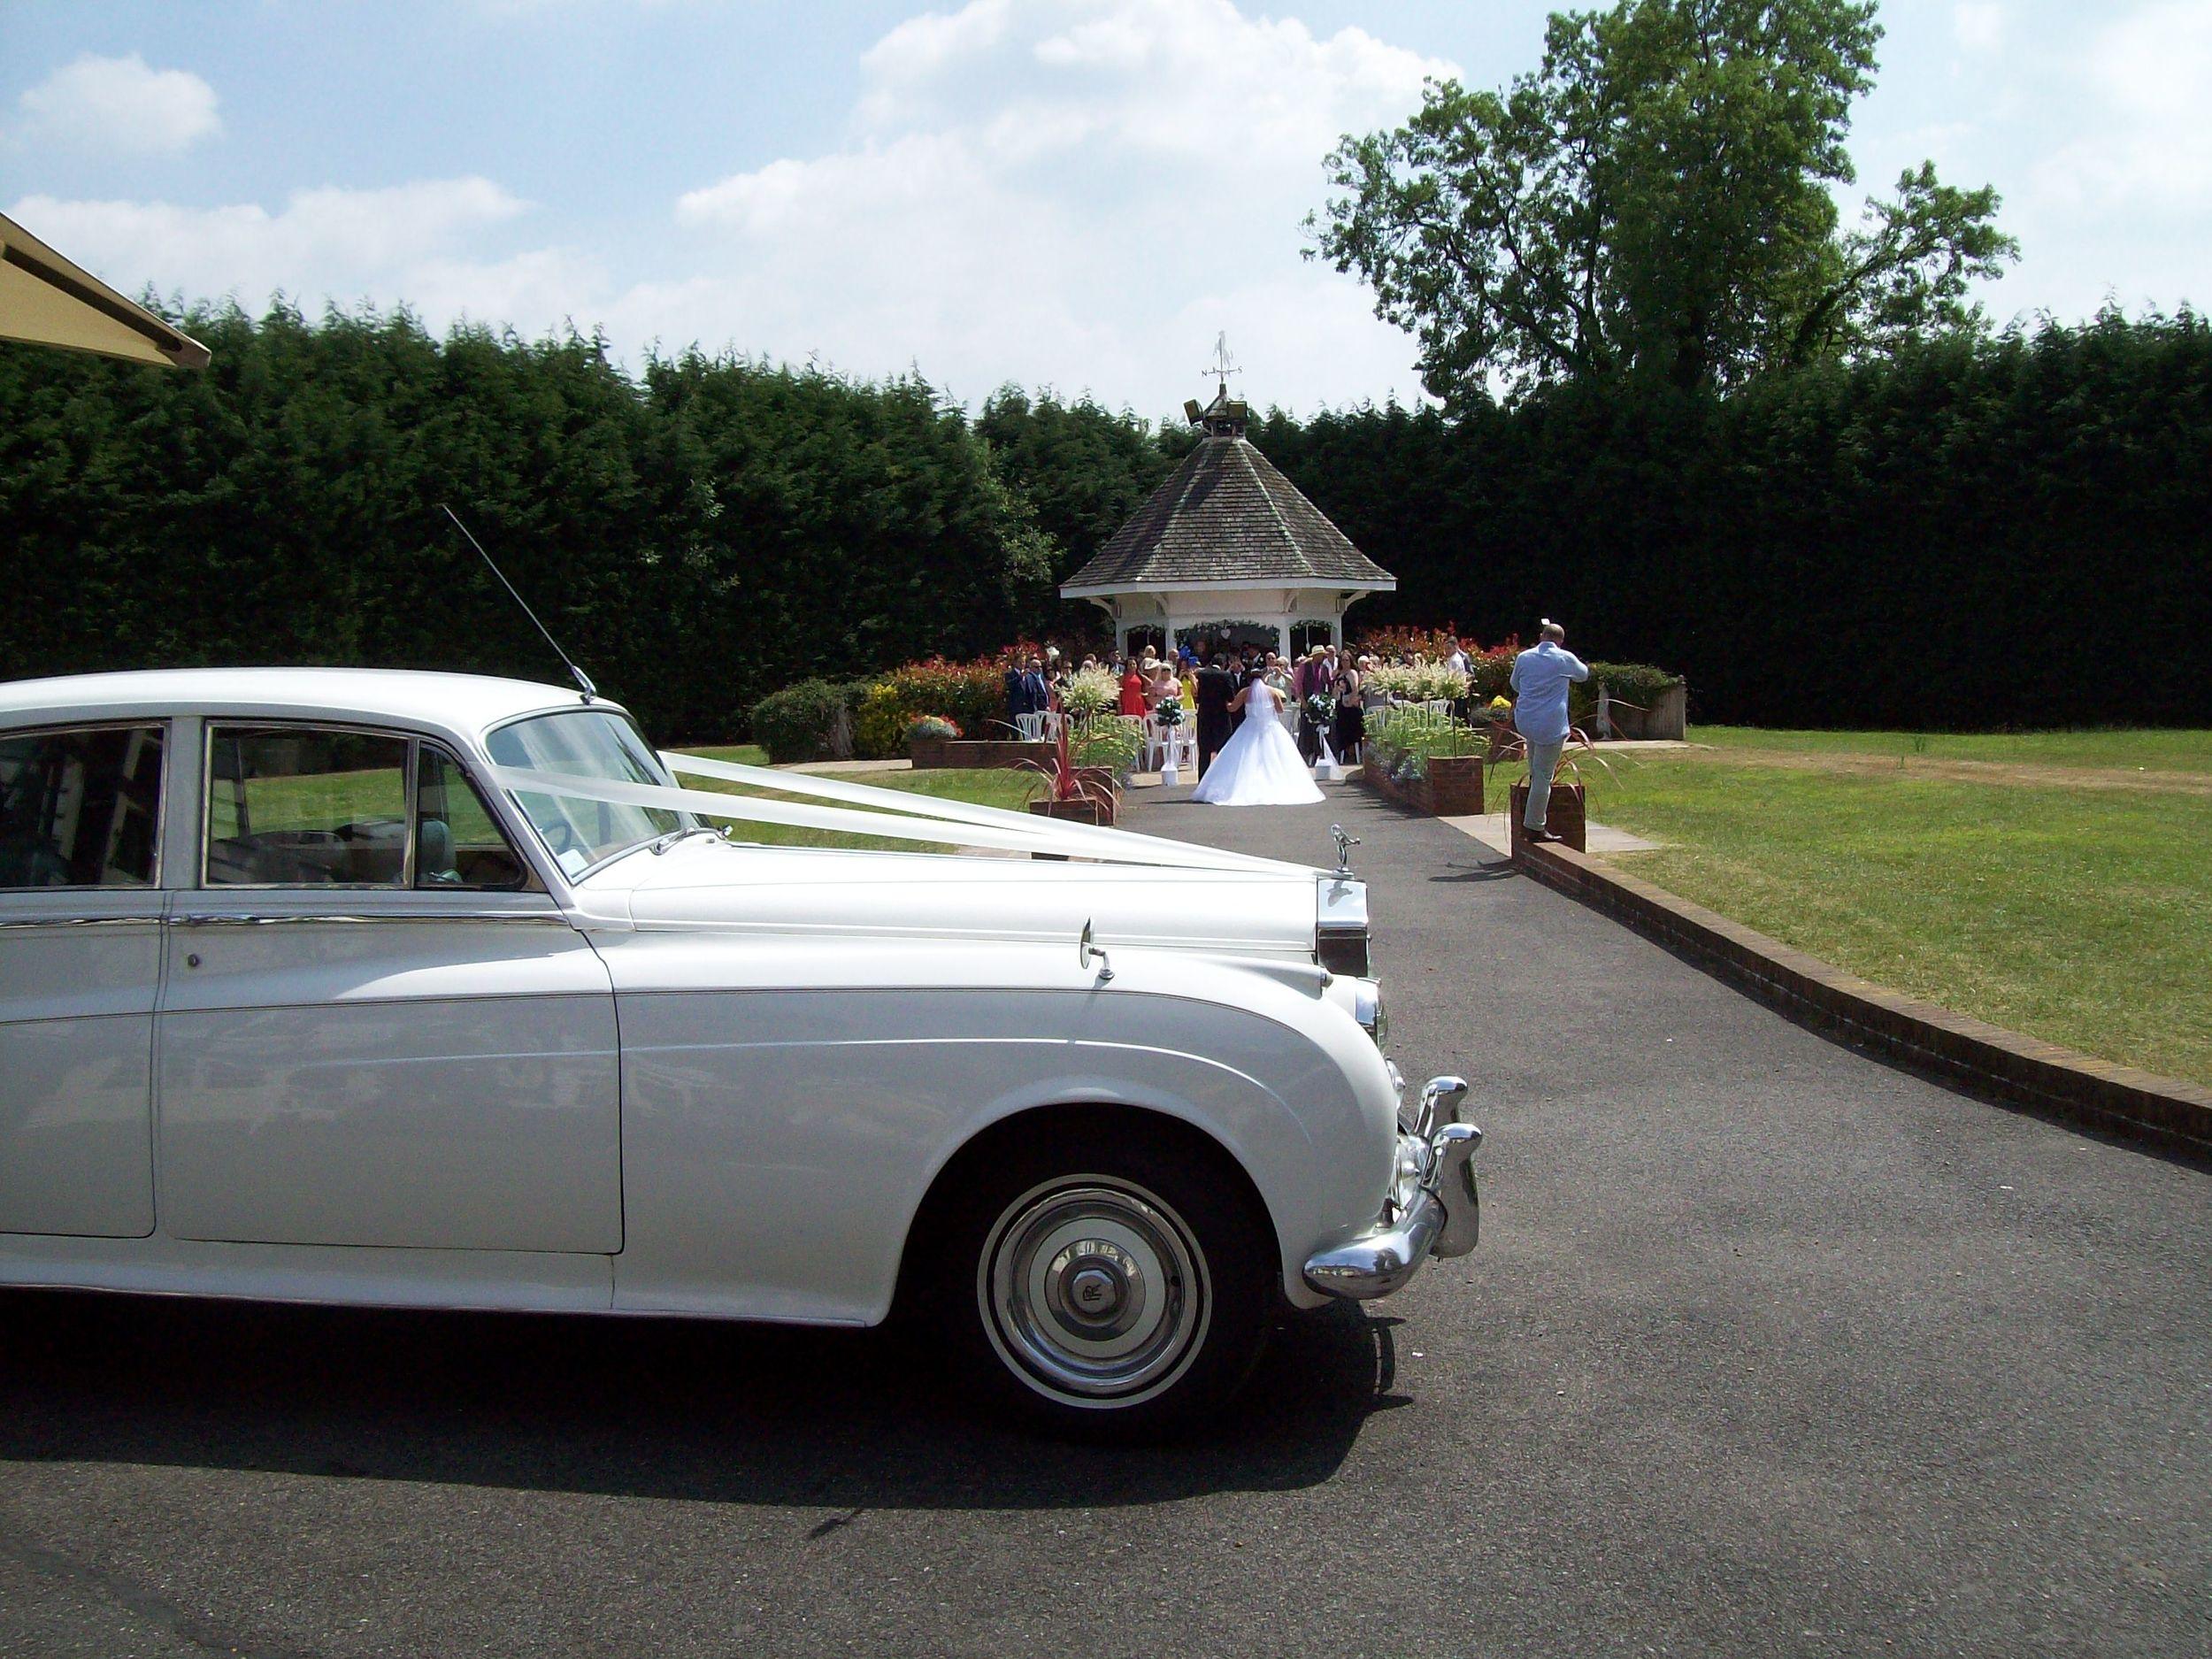 Kent wedding cars at Hop Farm, Paddock Wood.